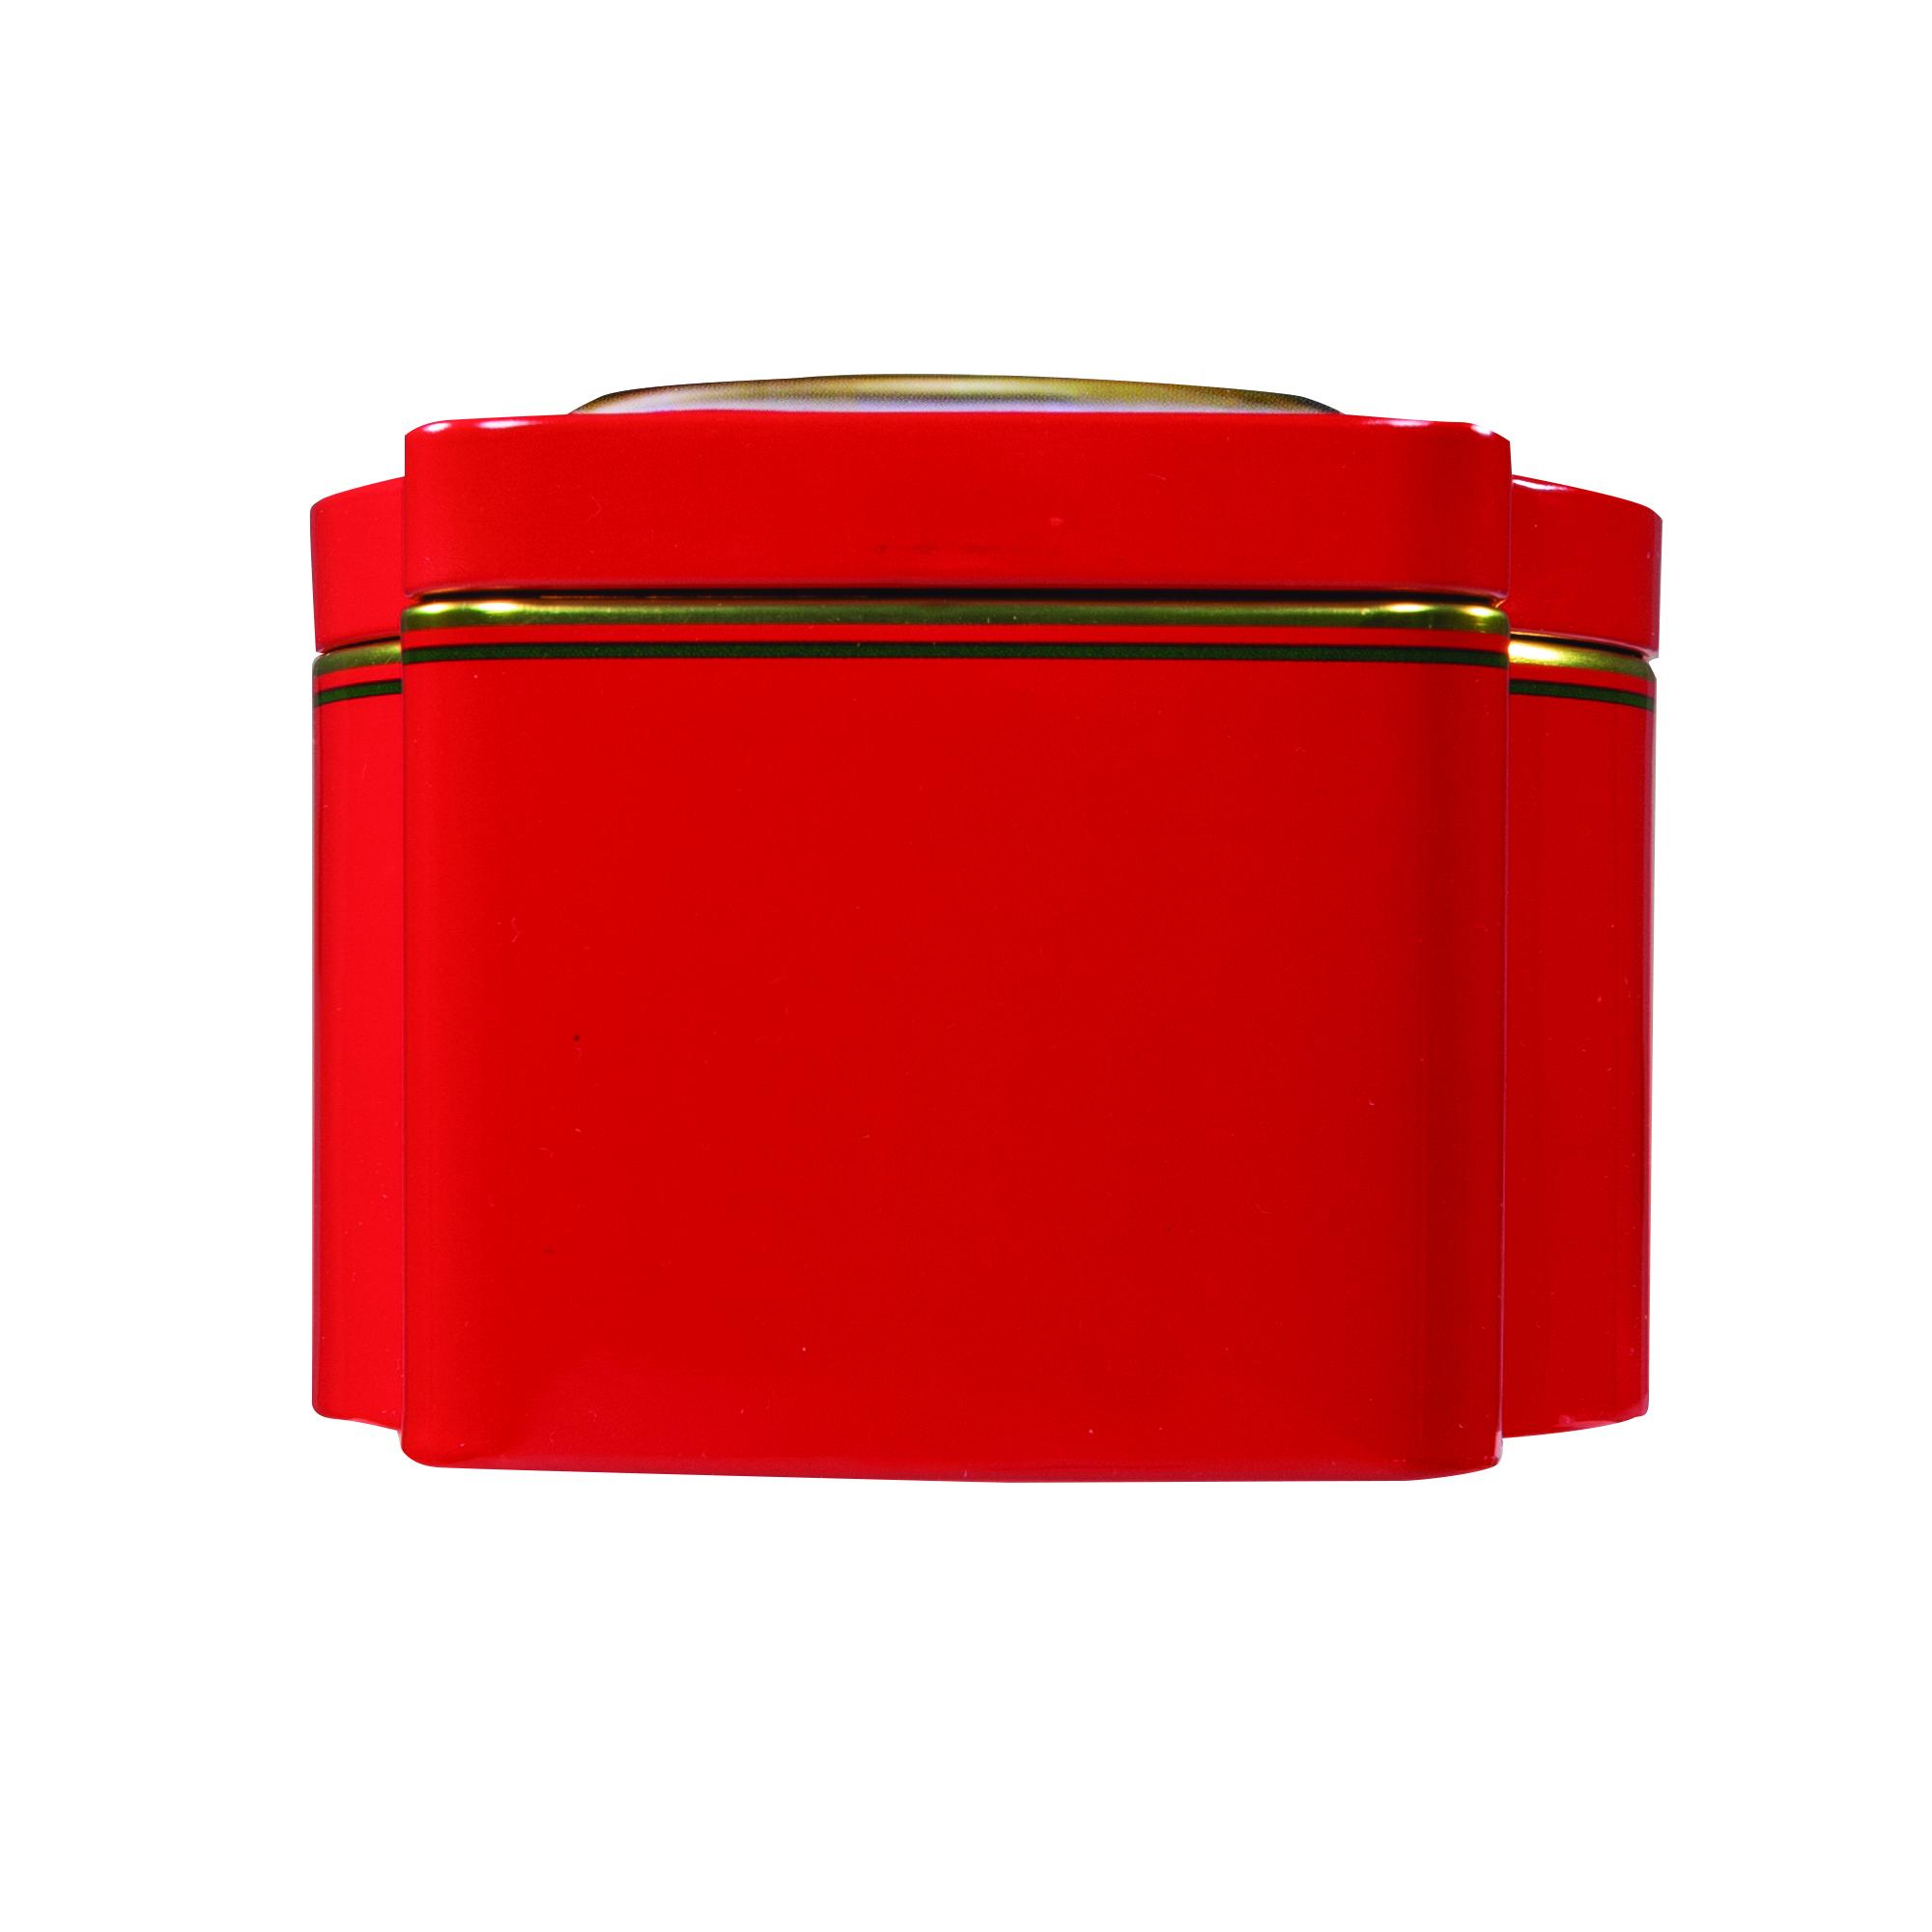 5945 11.3 oz Nutcracker Tin: Almond ROCA®, Dark ROCA® - Top View